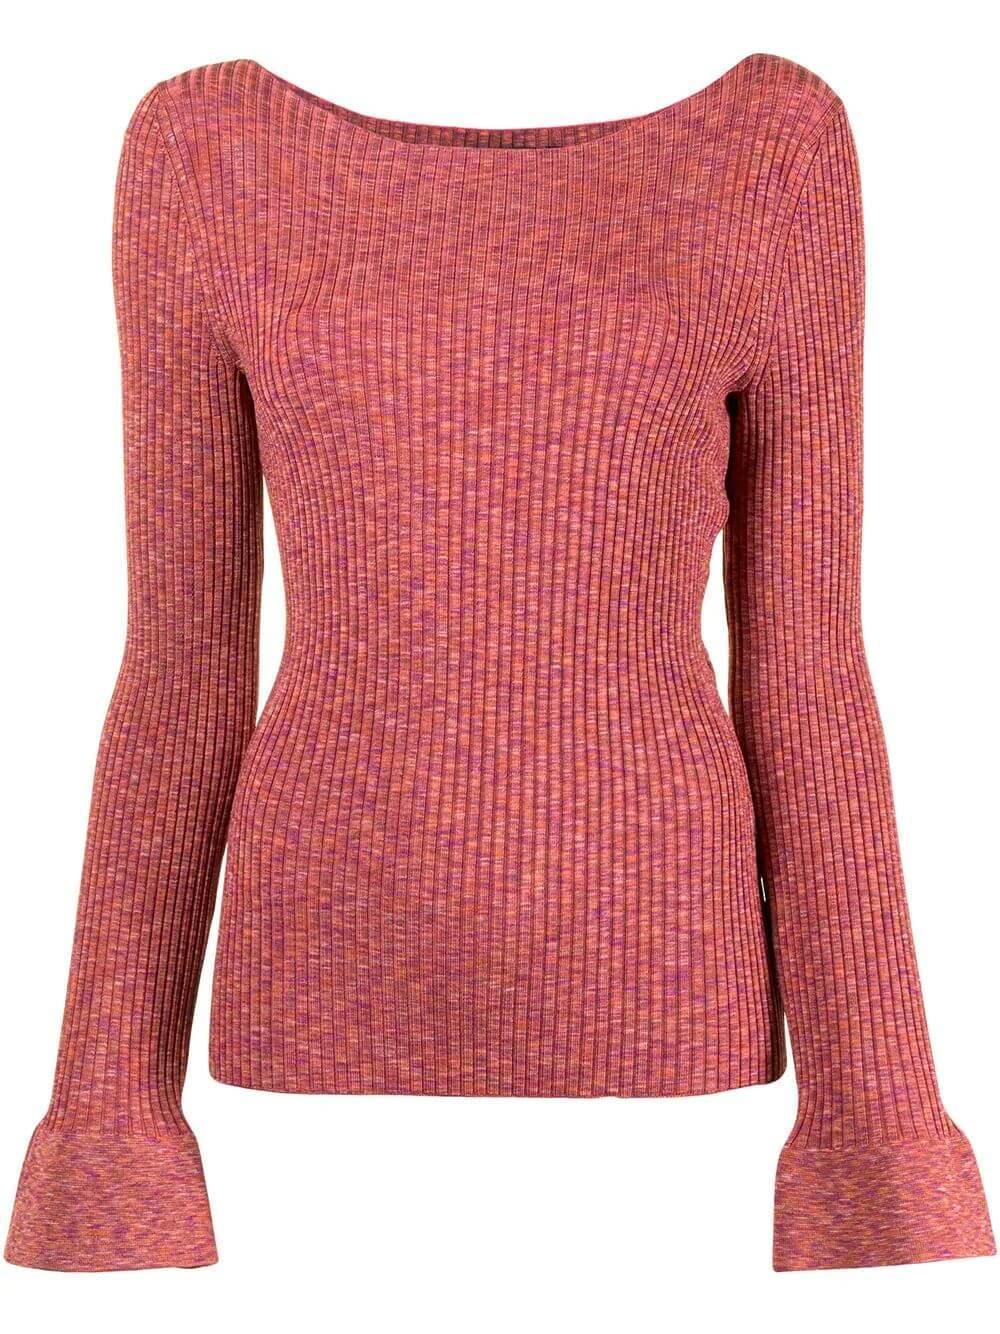 Boatneck Multi Knit Item # K1116717